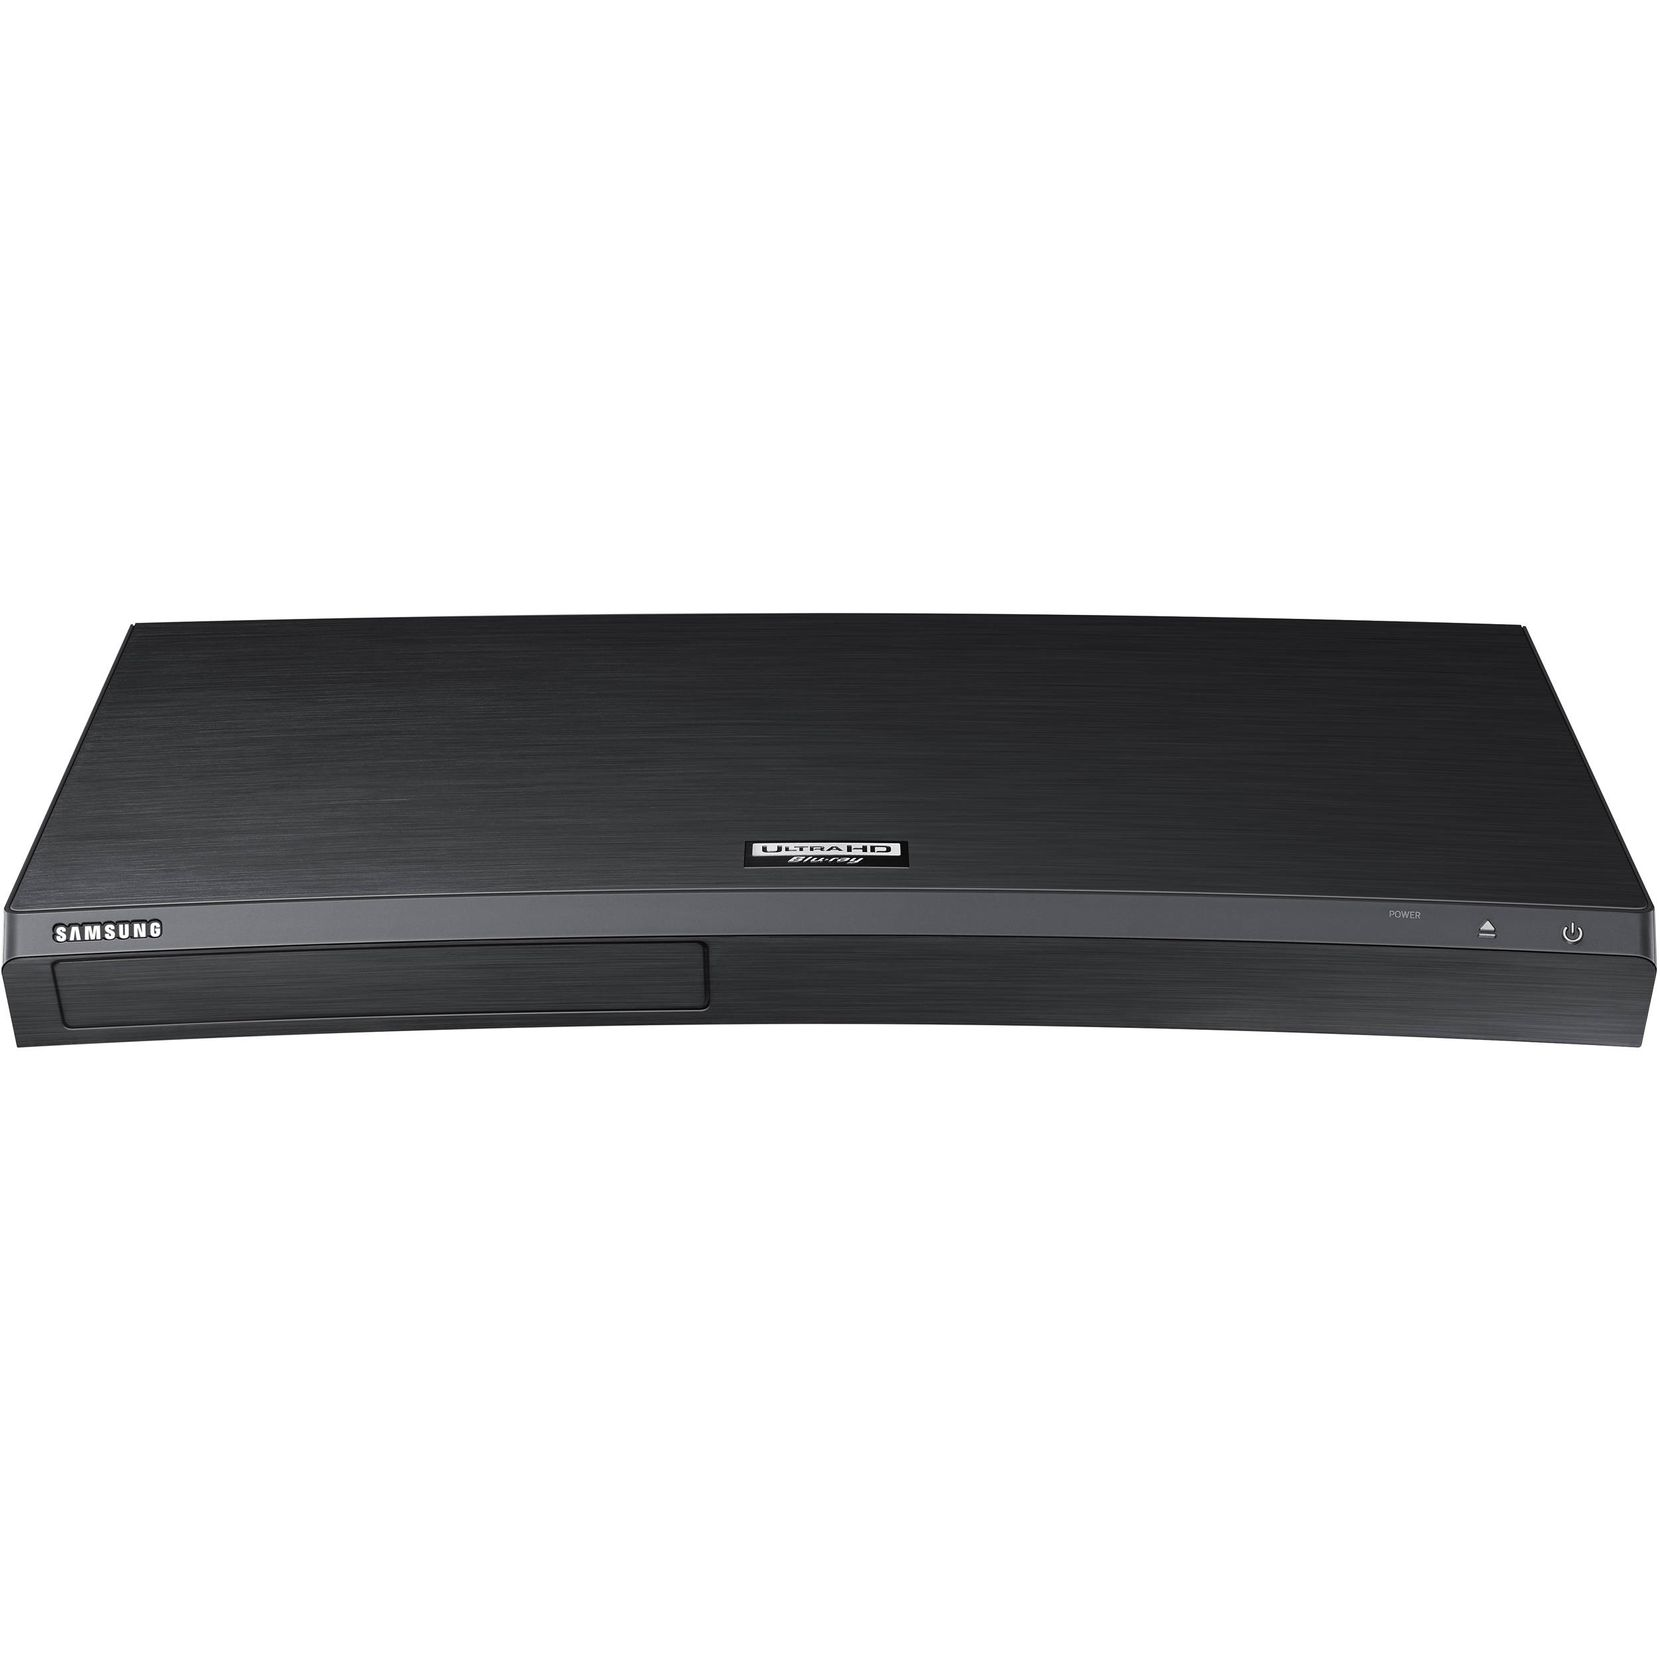 Samsung UDB-M9500 Ultra HD Blu-Ray DVD player.